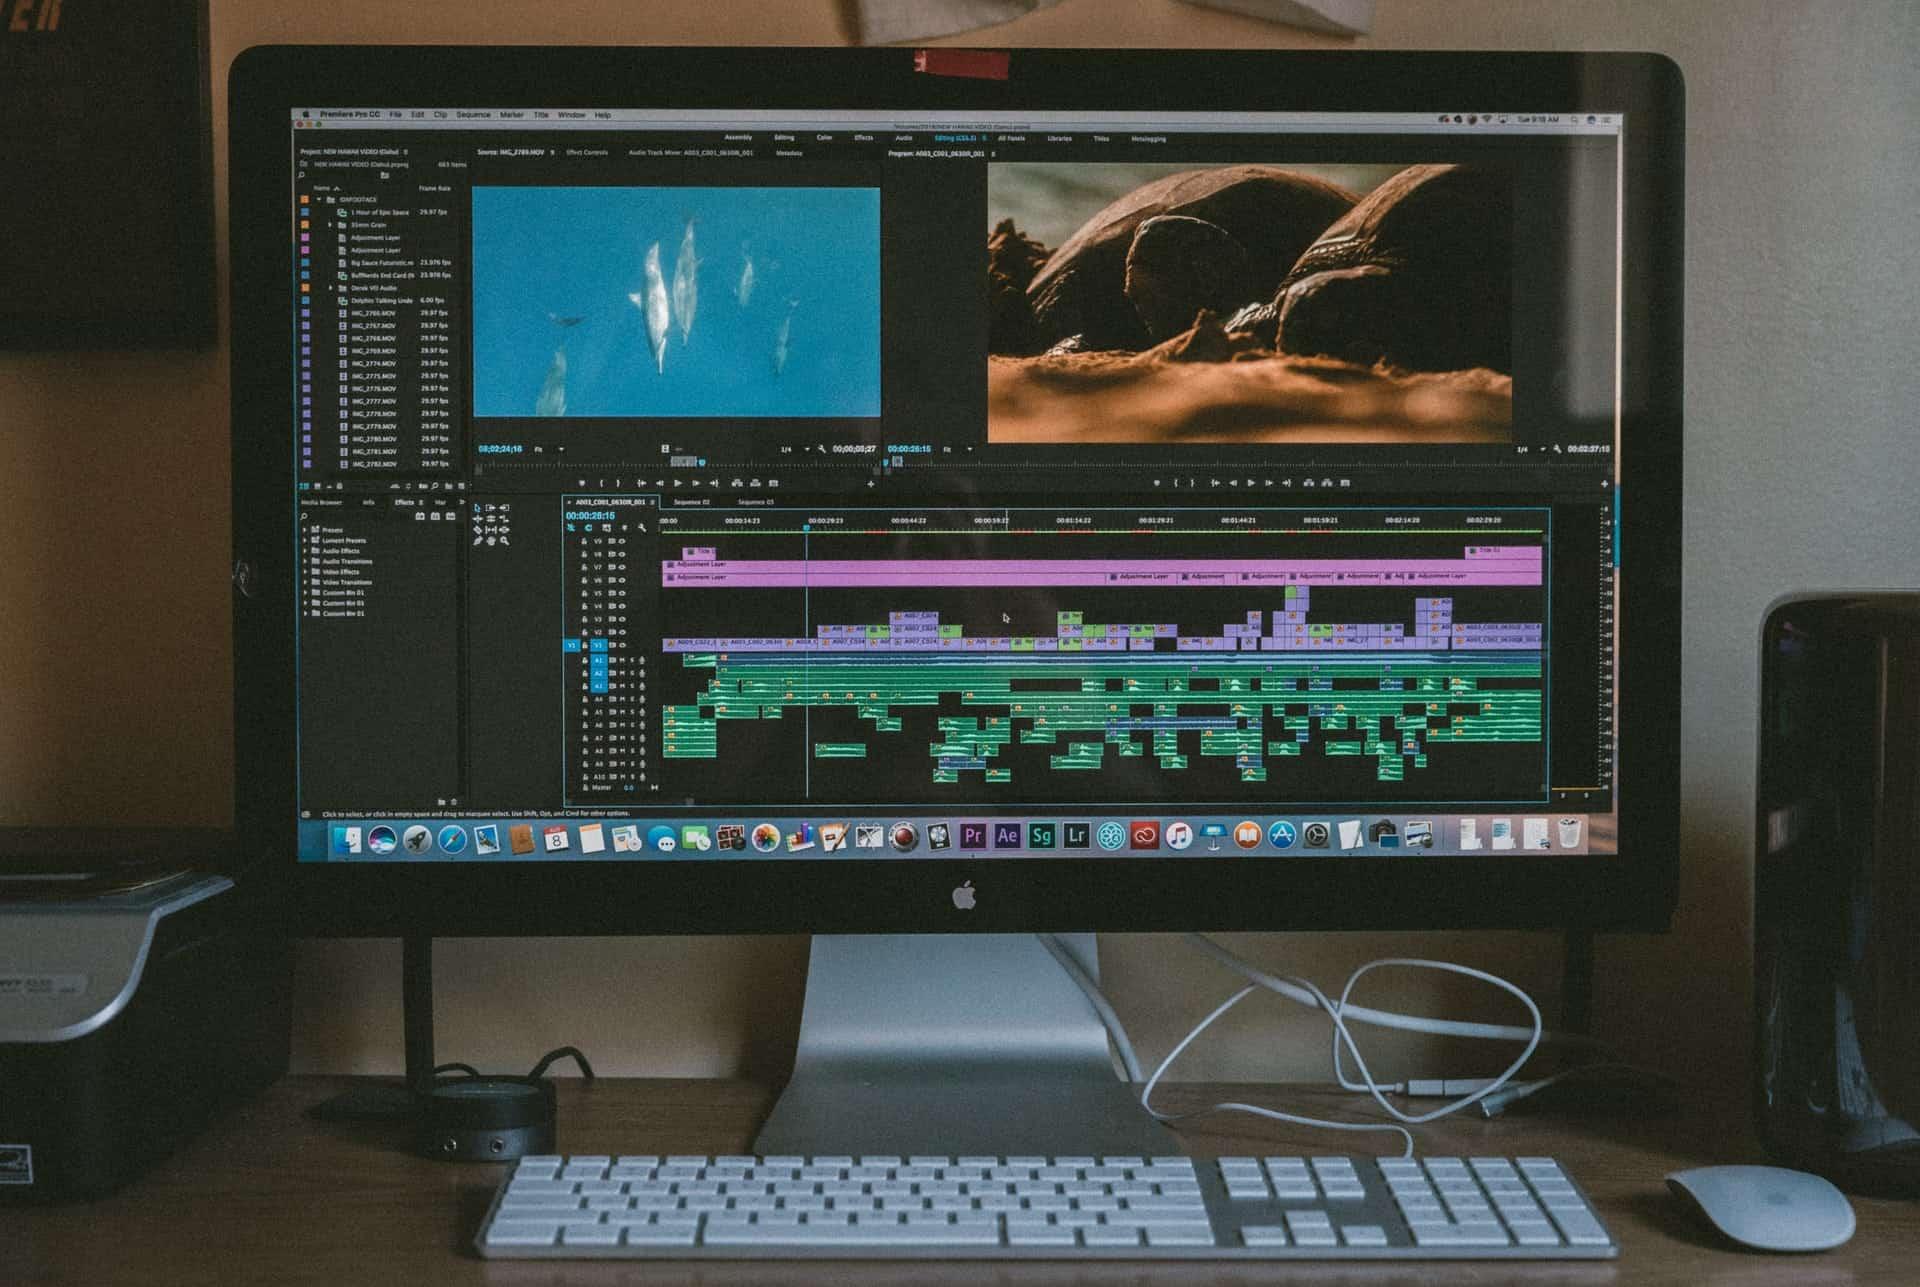 Video editor open on Mac PC